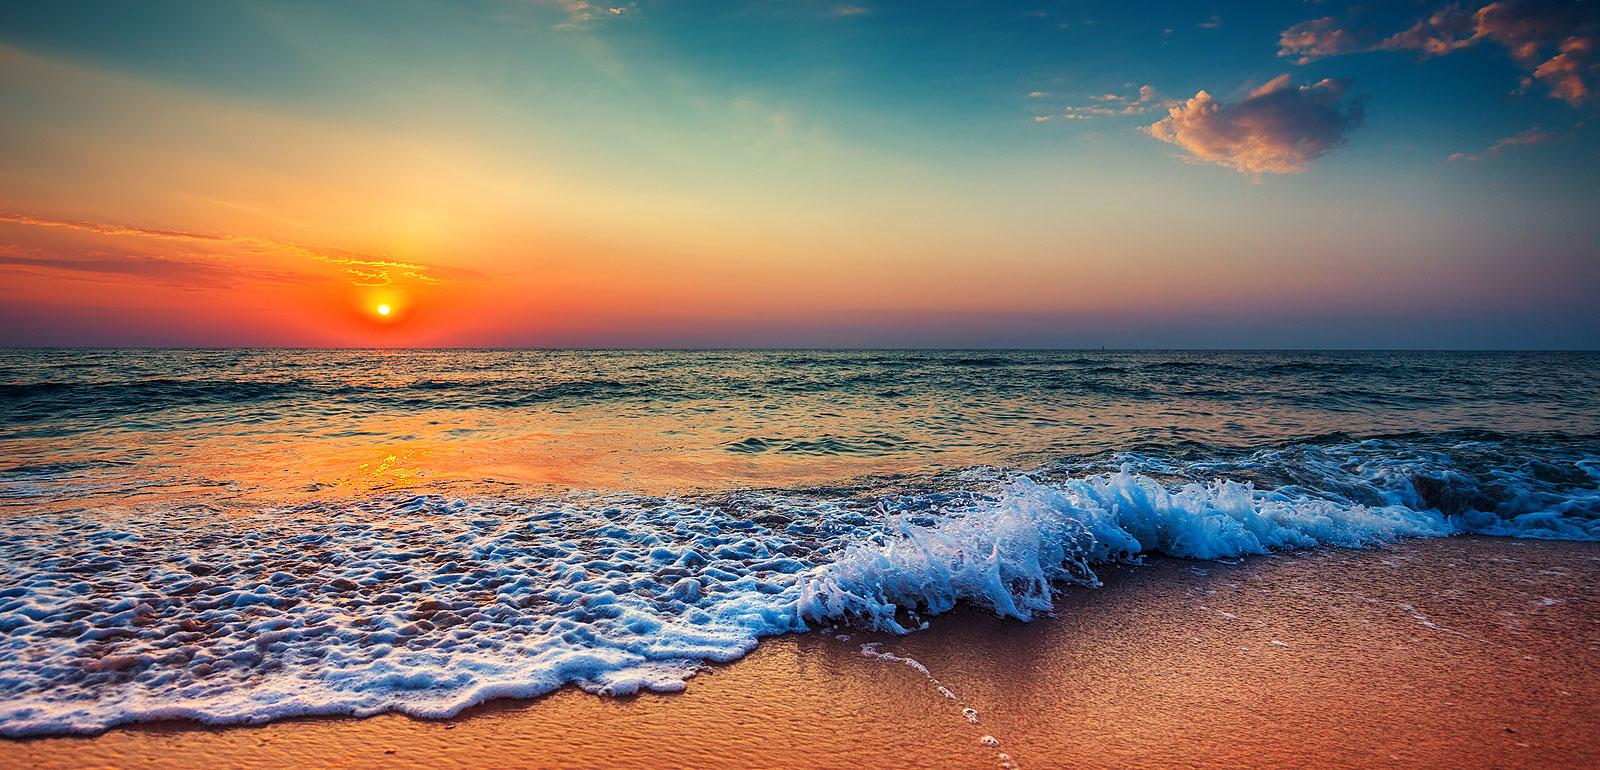 Stunning beach in Ruskin, FL